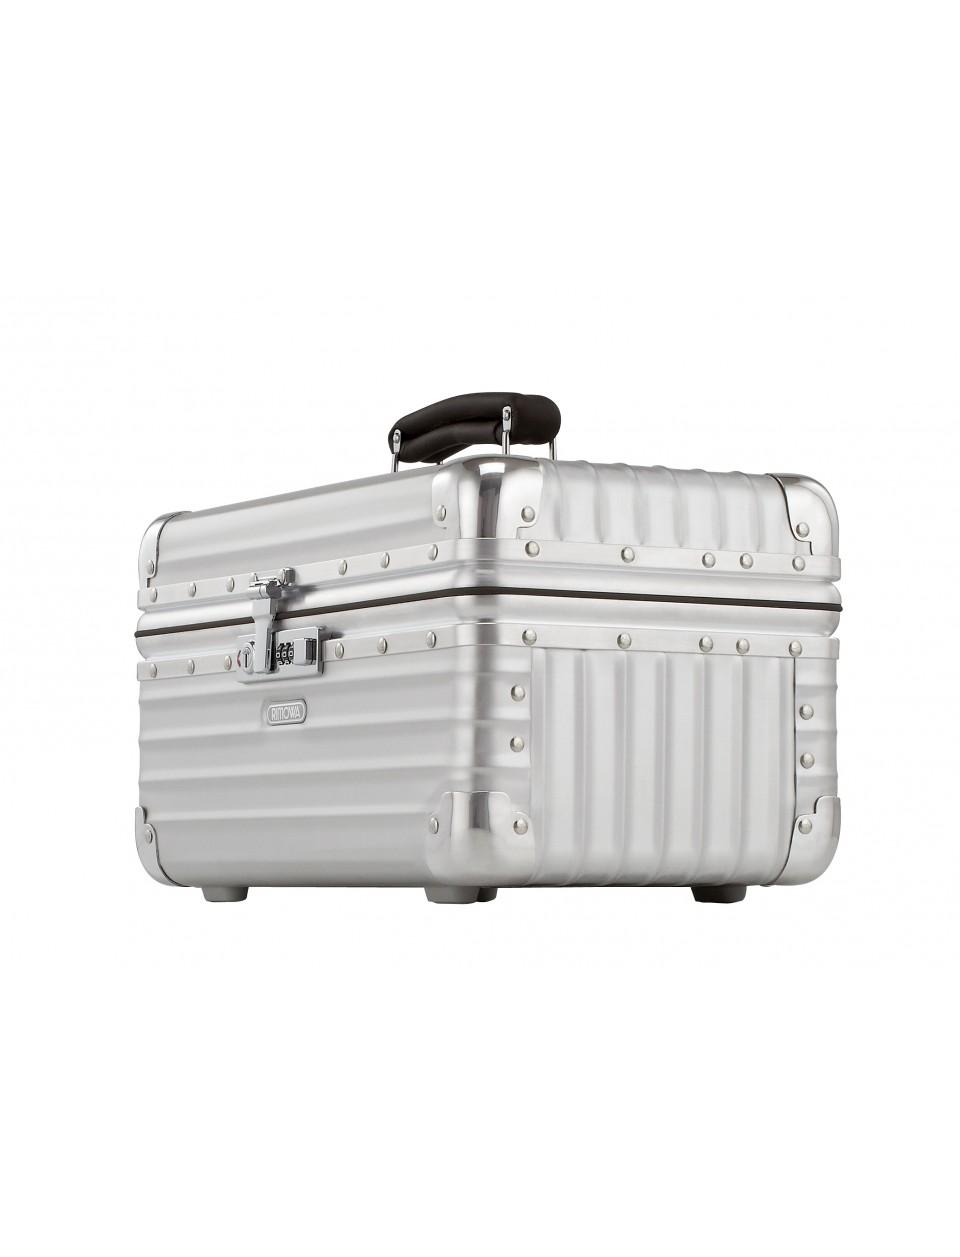 rimowa classic flight beauty case. Black Bedroom Furniture Sets. Home Design Ideas